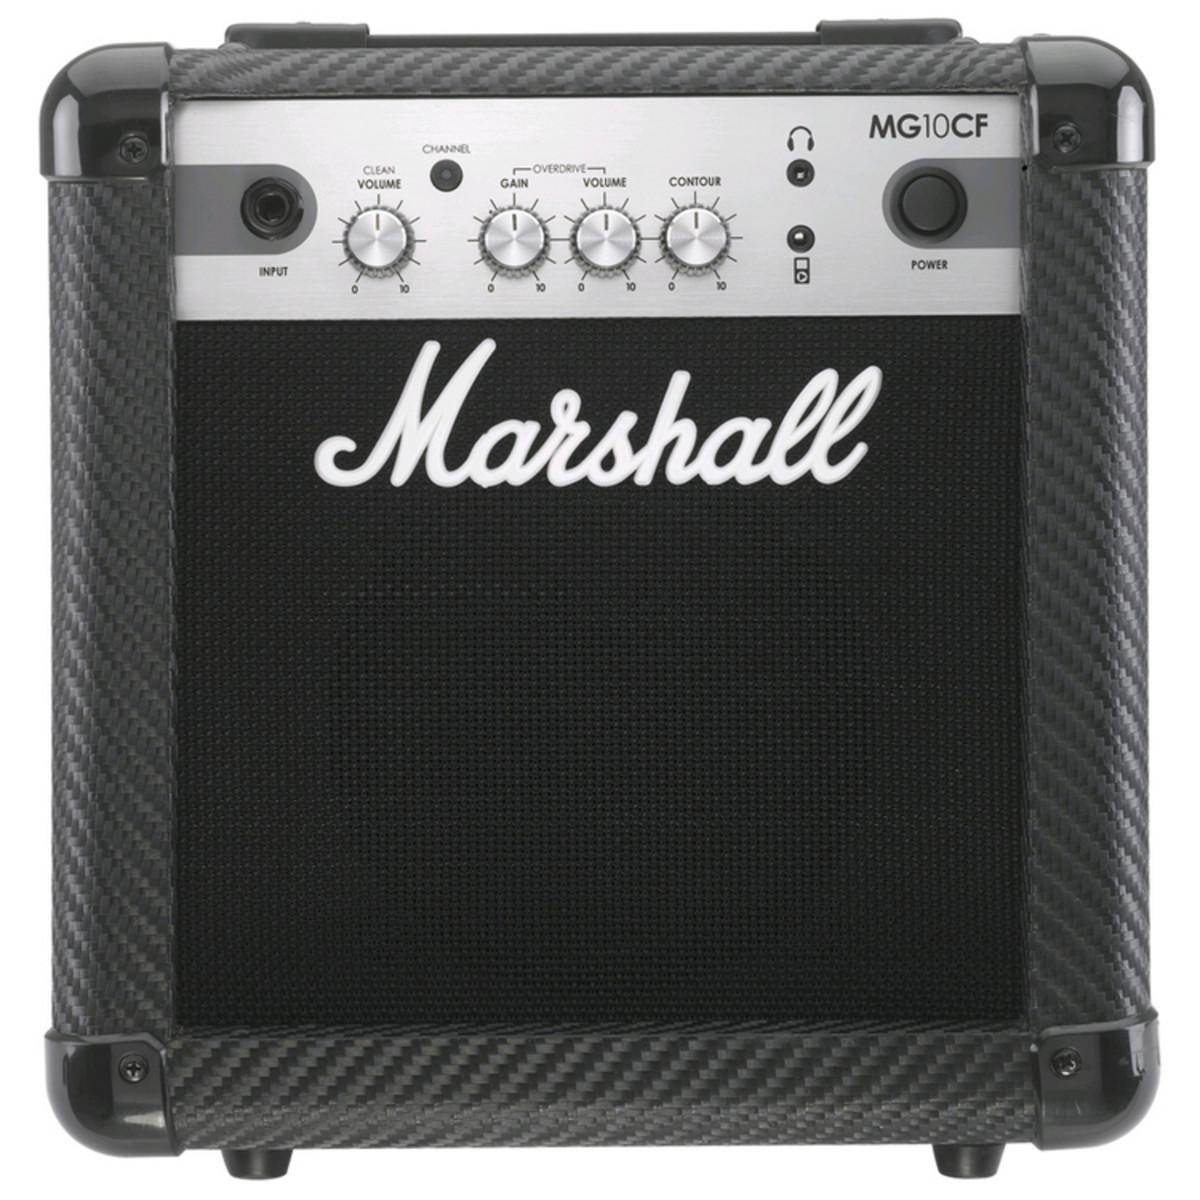 Image of Marshall MG10CF Carbon Fibre 10W Guitar Combo